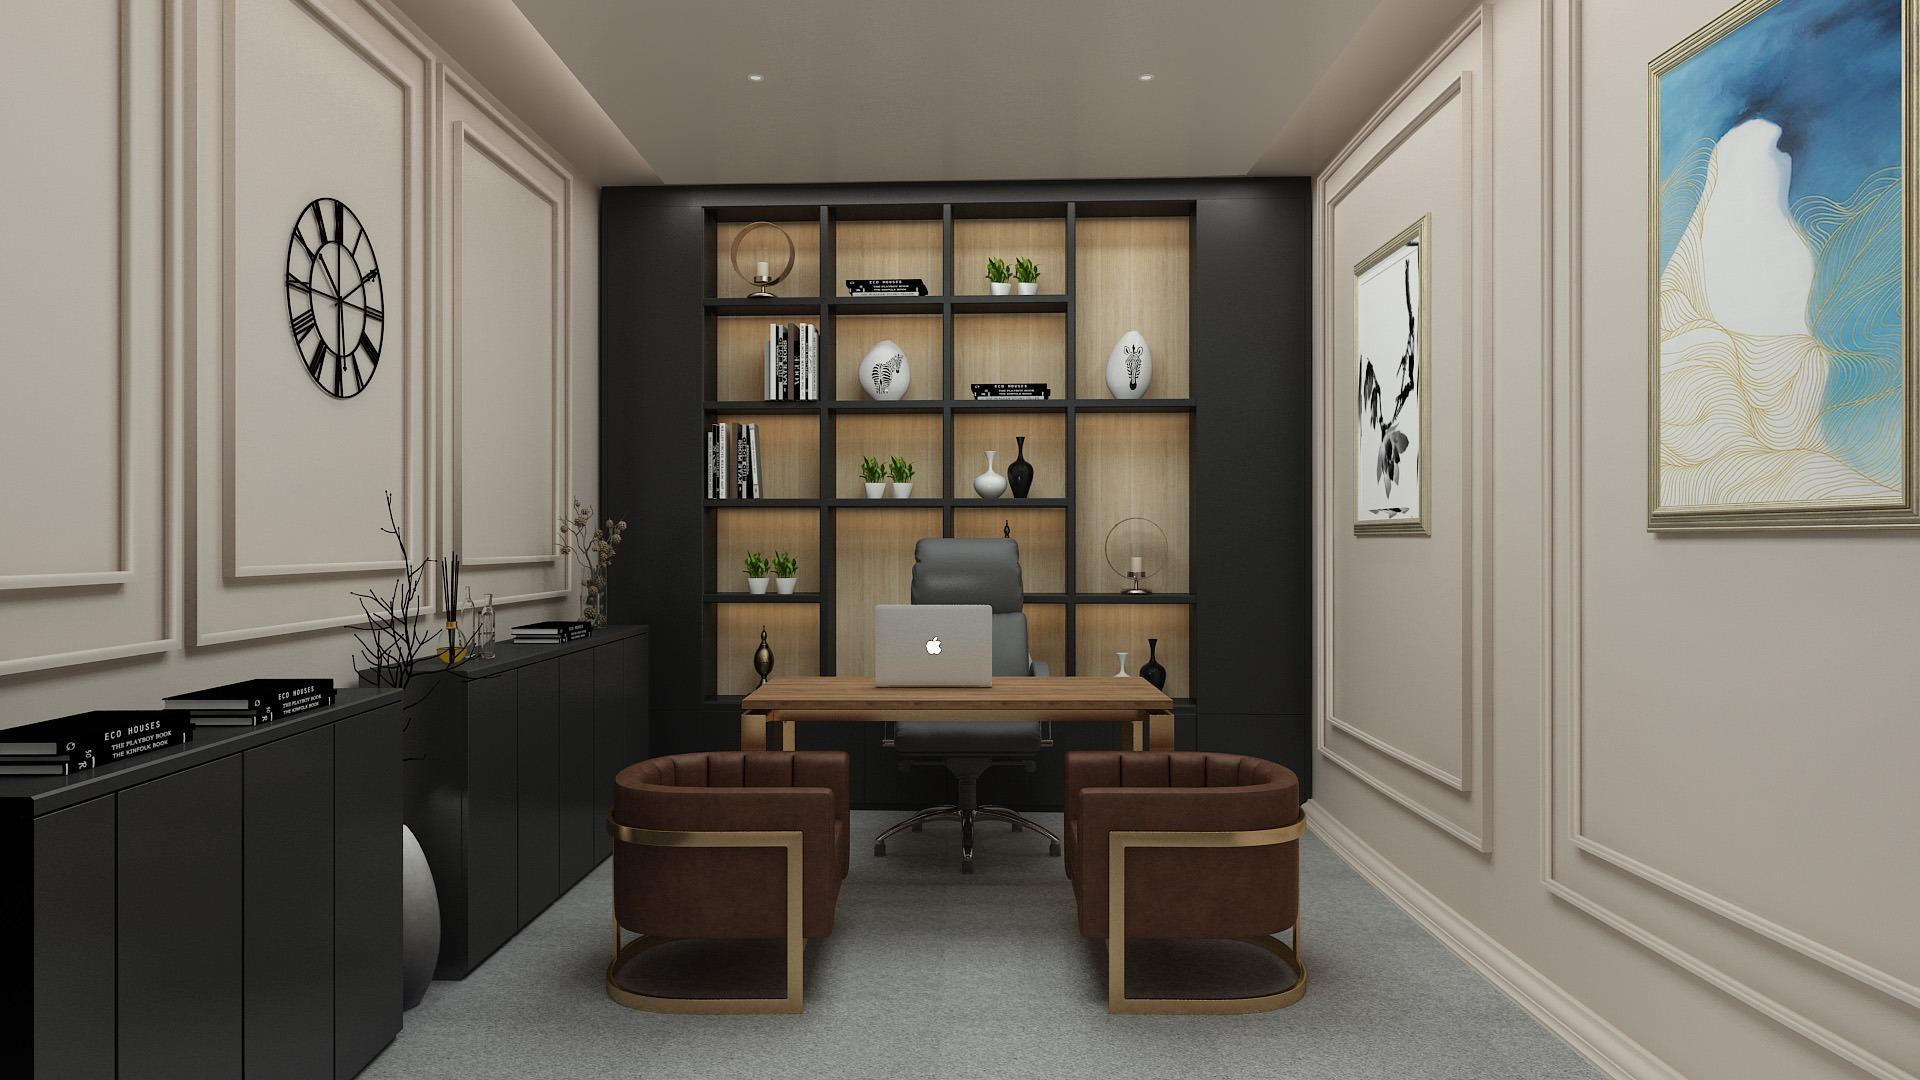 2. ofis 3.render